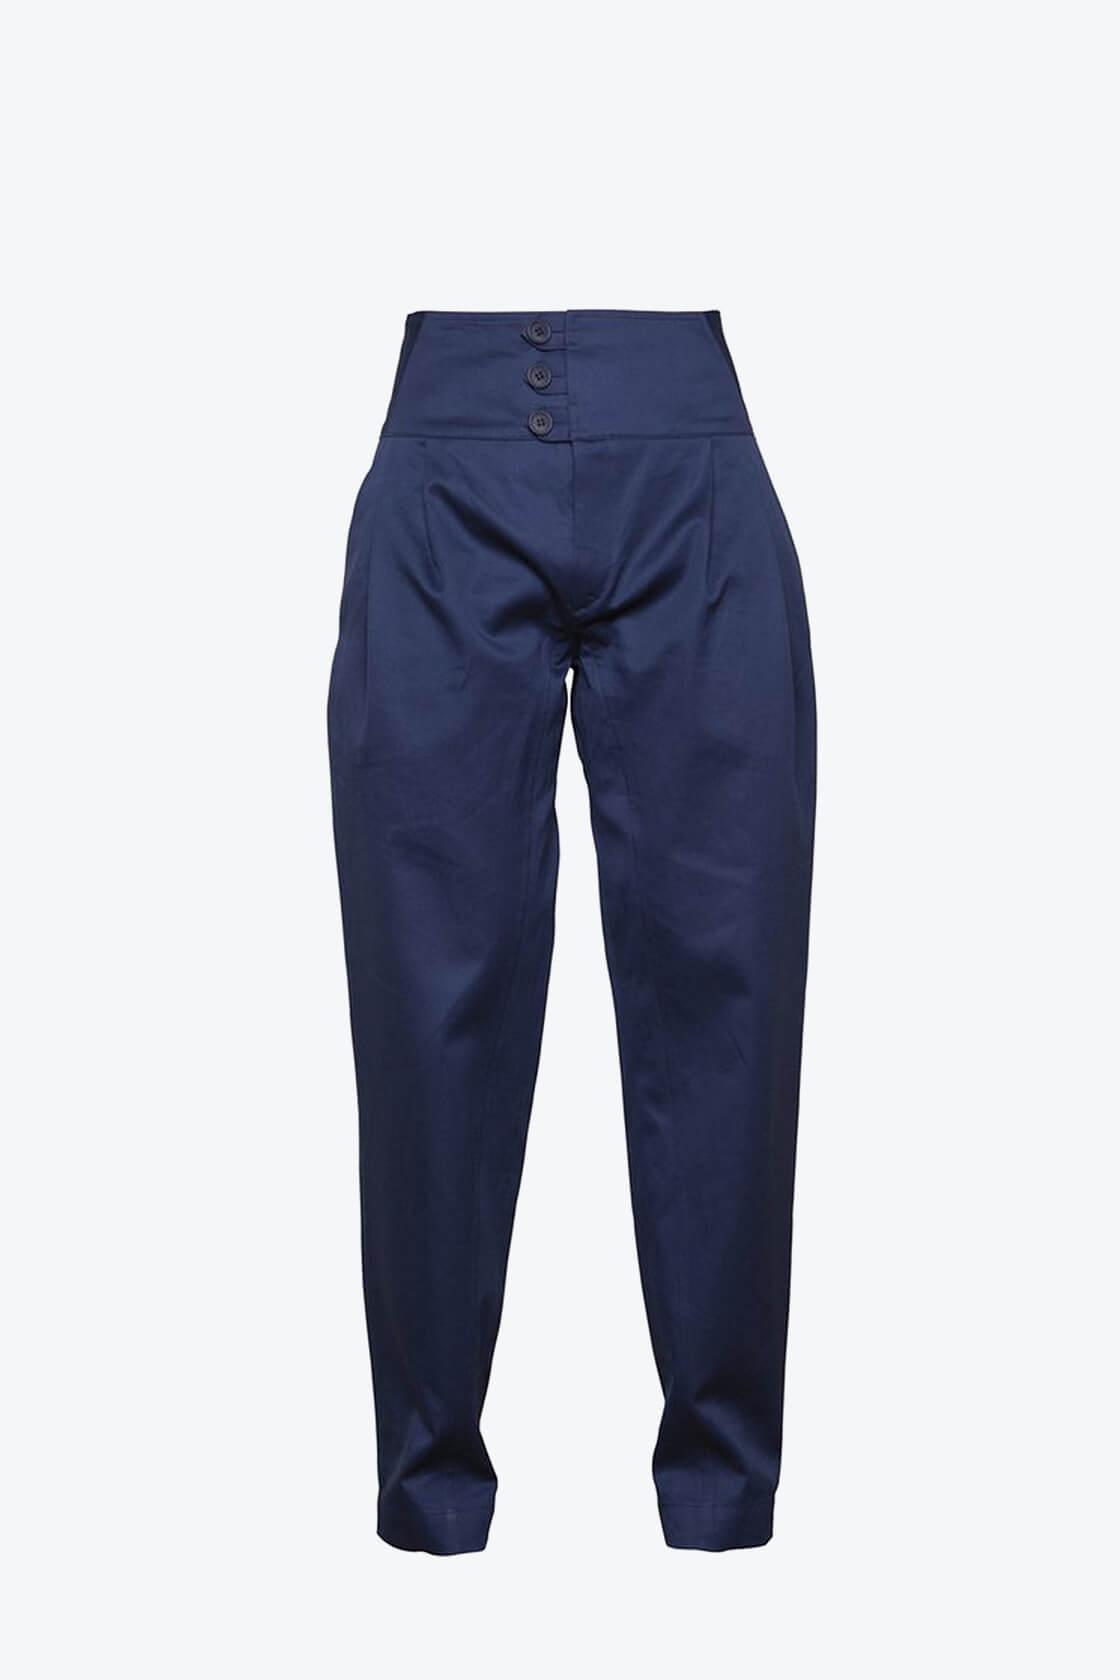 OL10000234 High waist trousers navy blue1